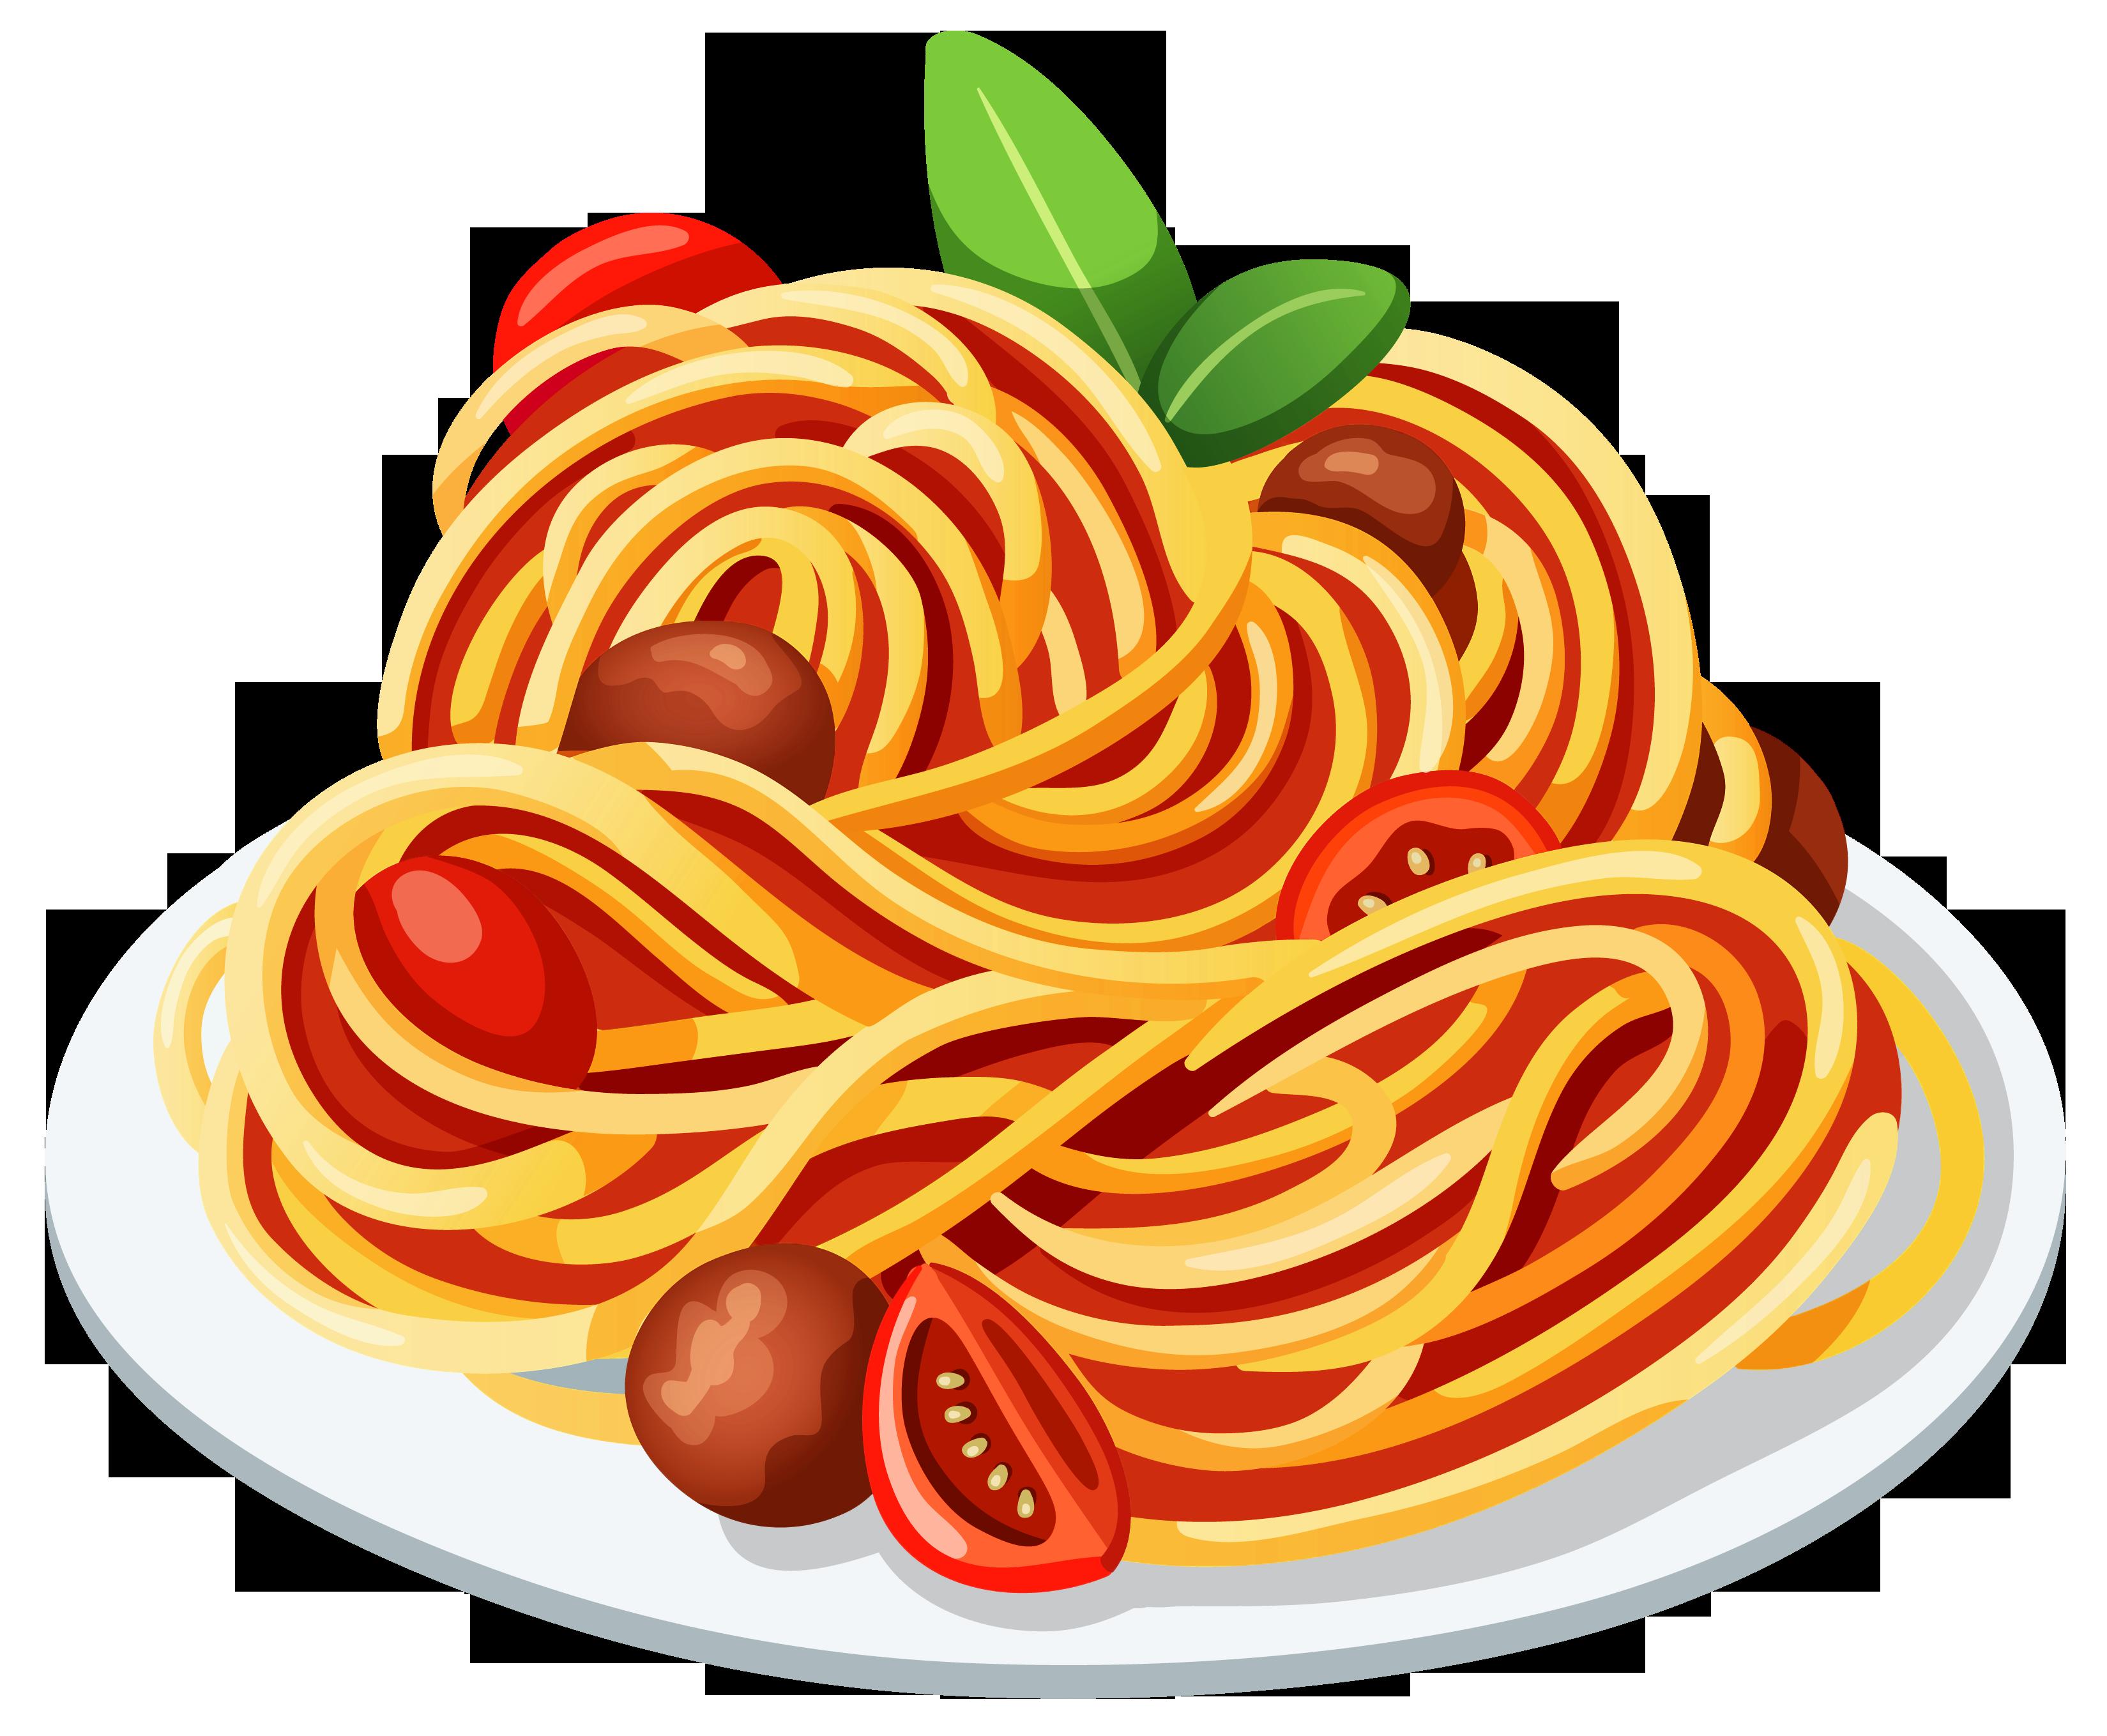 Spaghetti pasta clipart free images jpg.